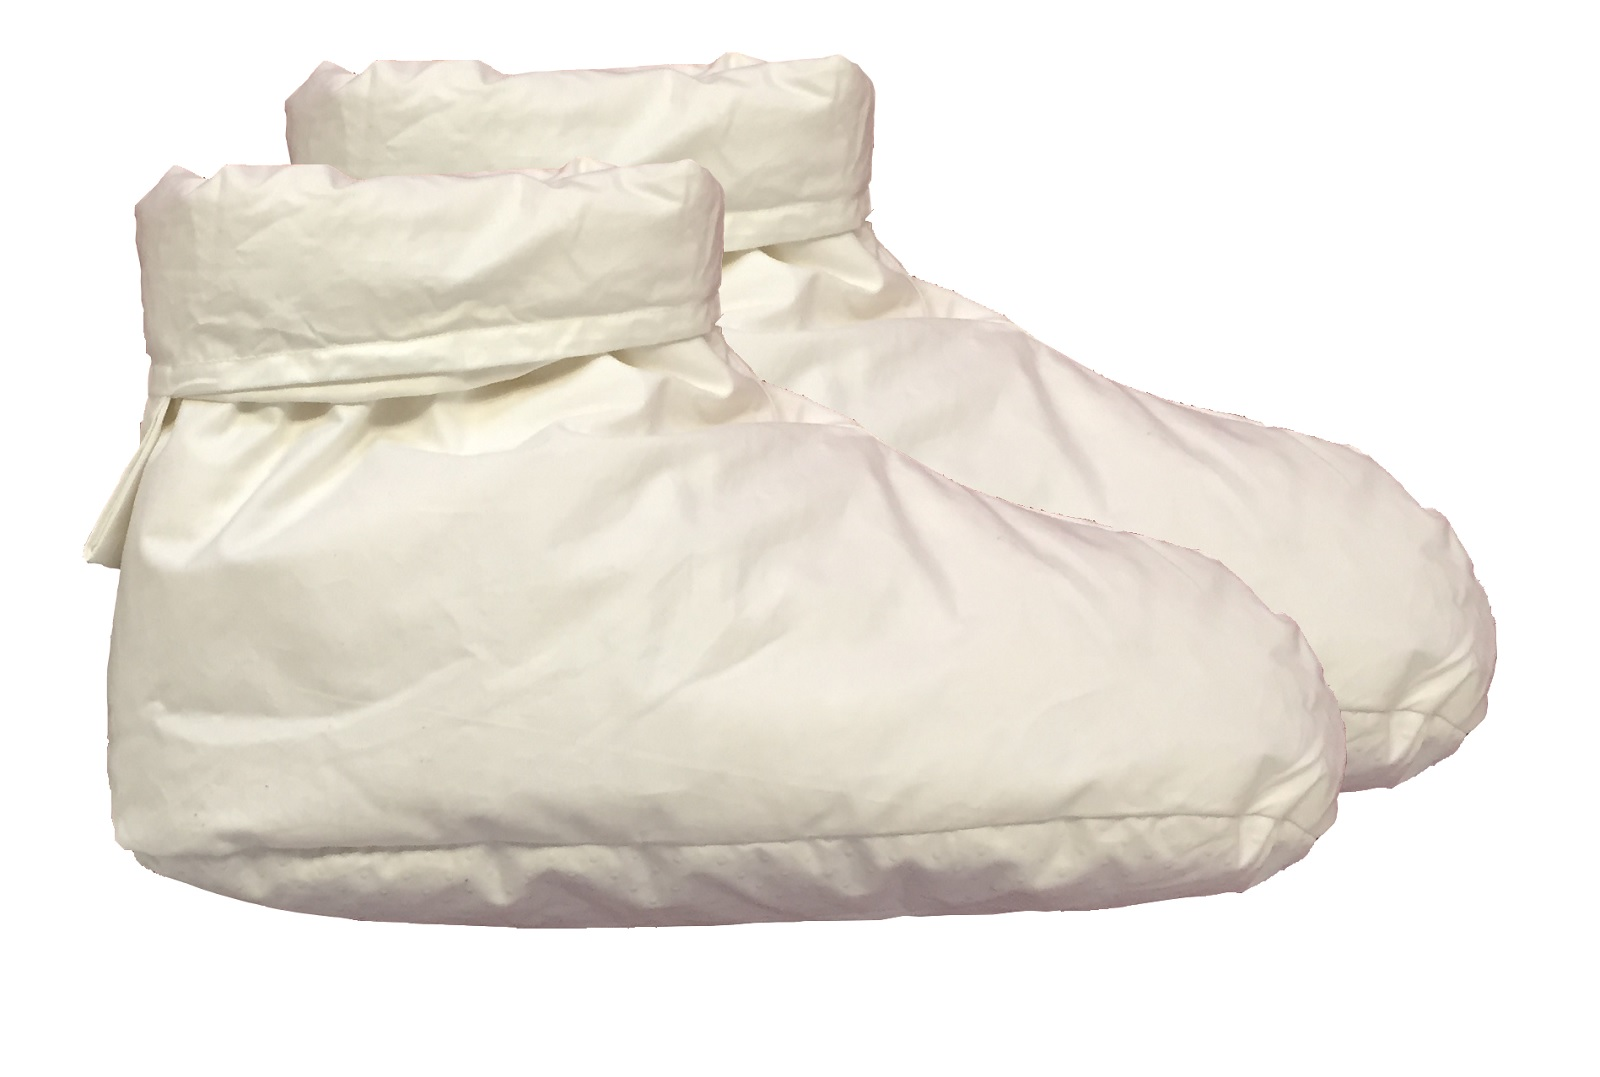 Daunenschuhe Bettschuhe Schlafschuhe mollig warm nie mehr kalte Füße Gr.38-42